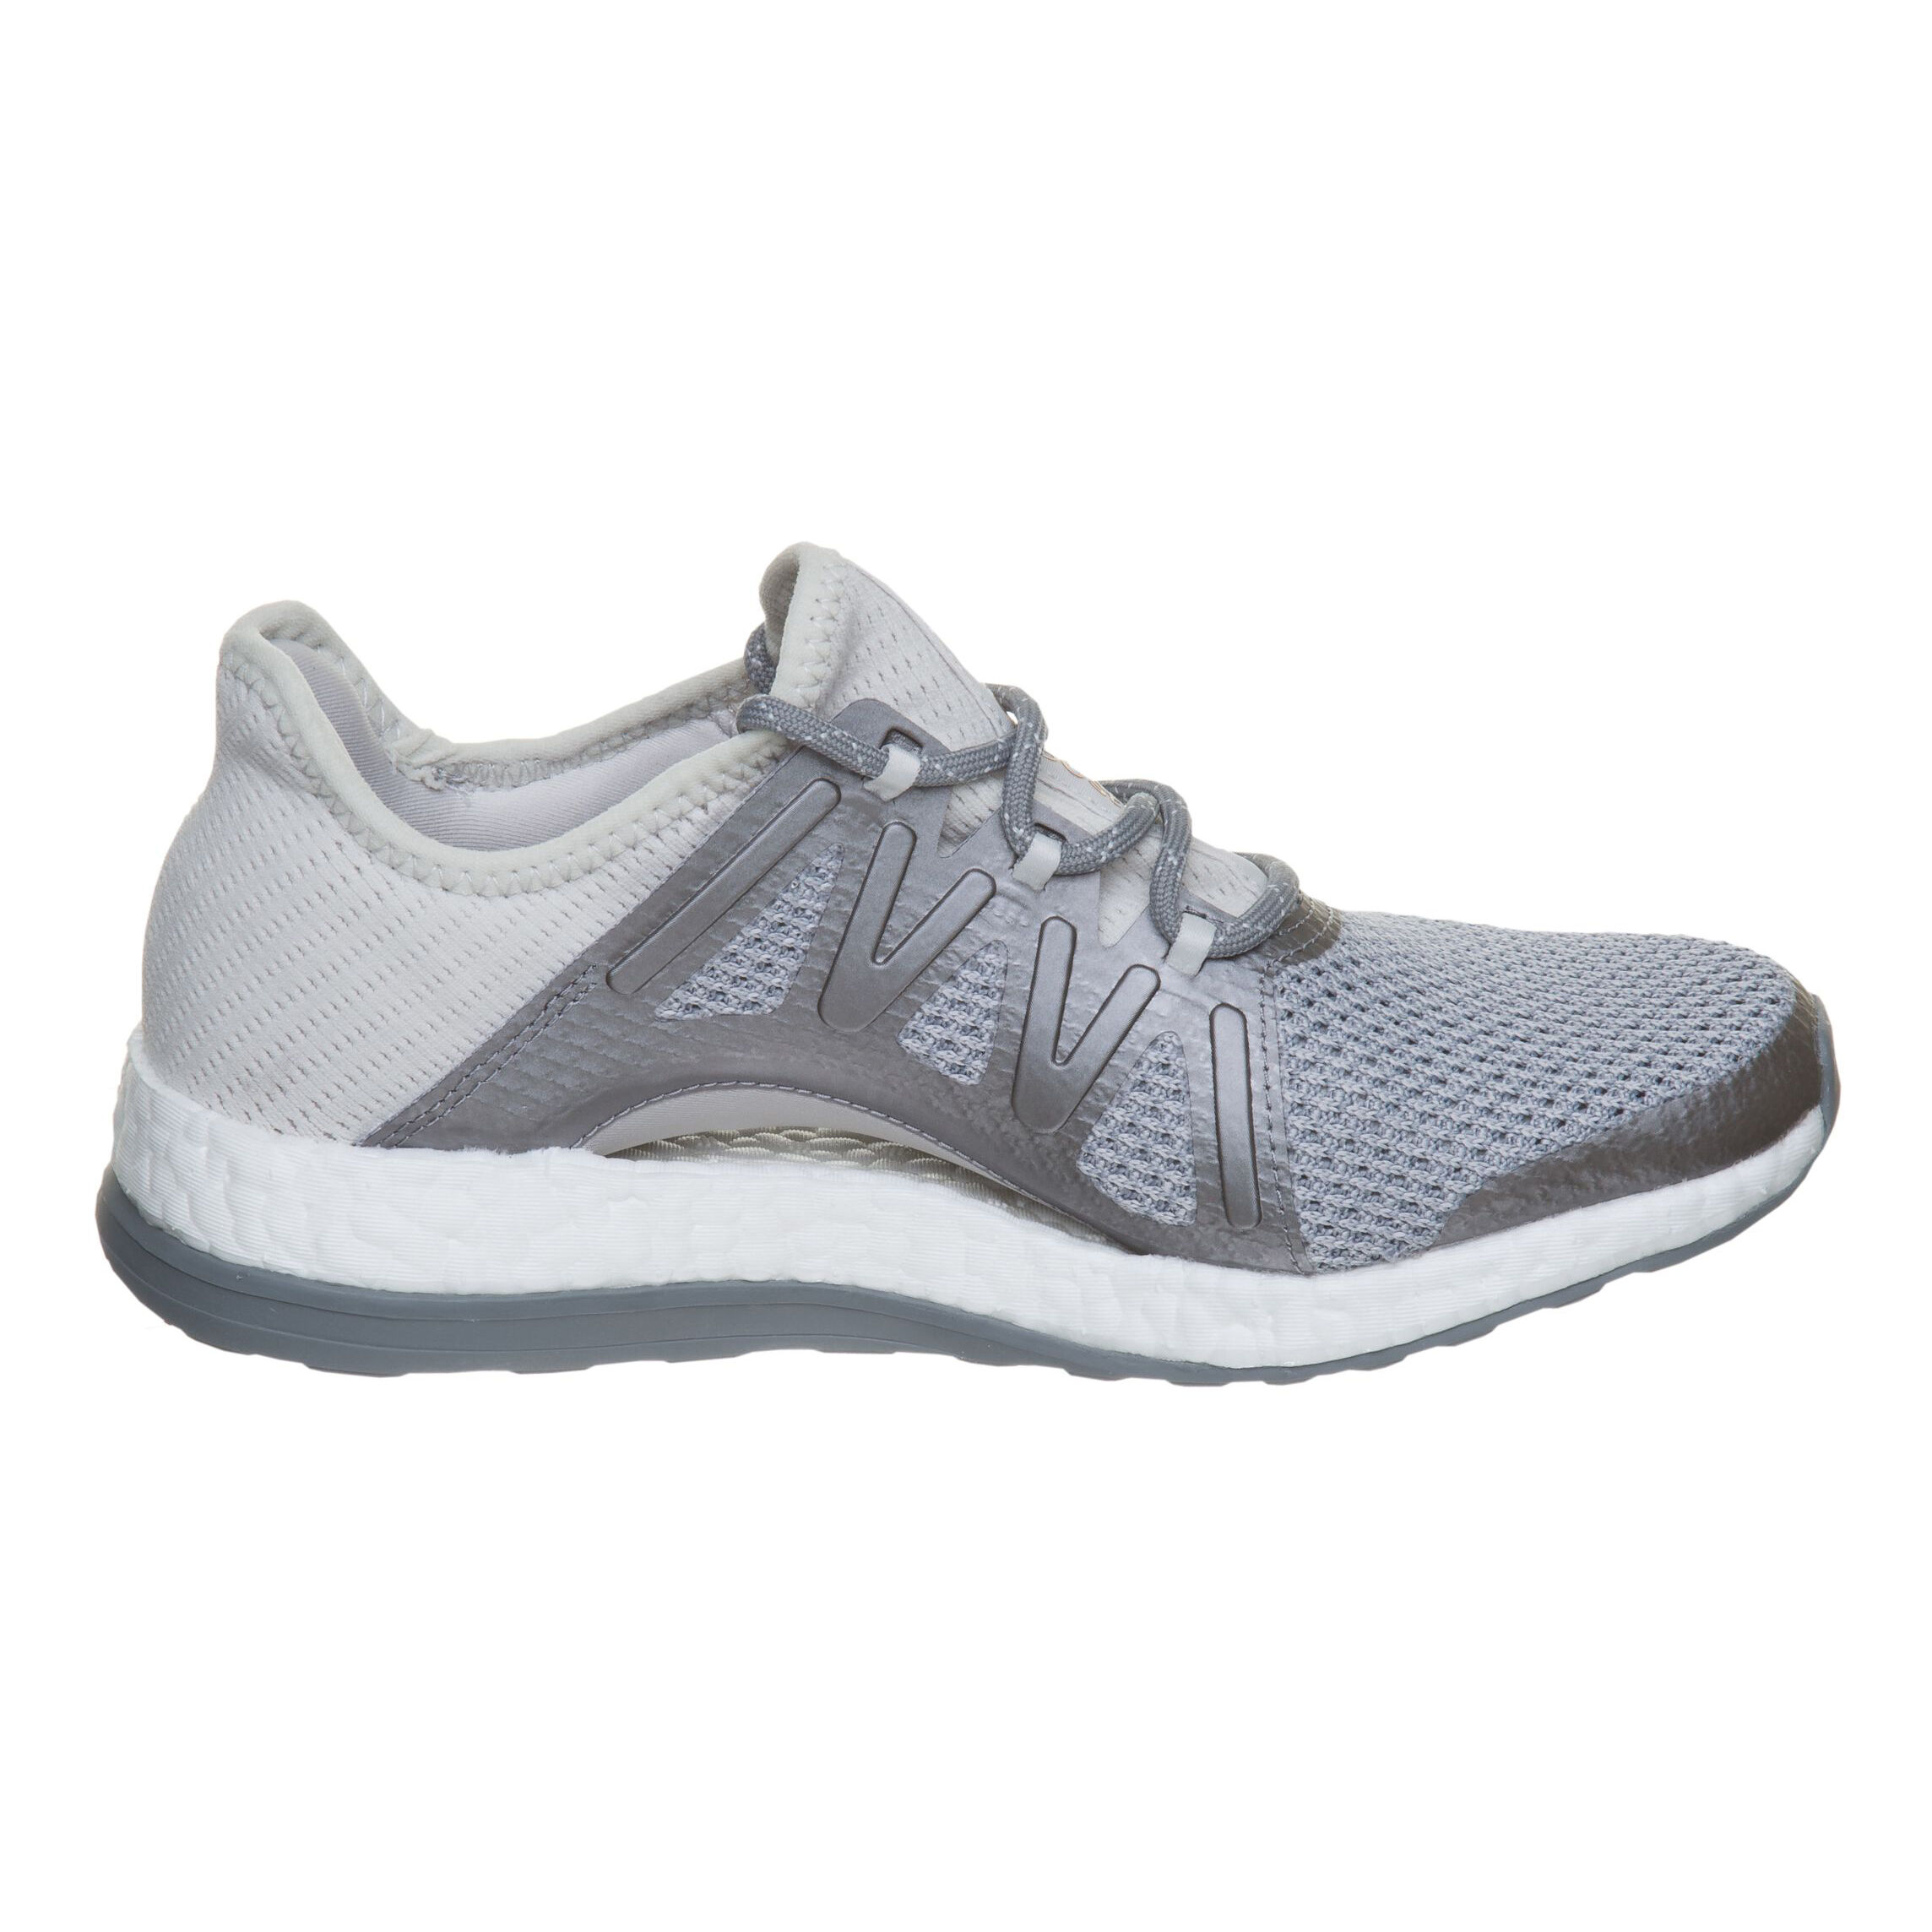 discount code for adidas pure boost weiß grün 55465 8d610